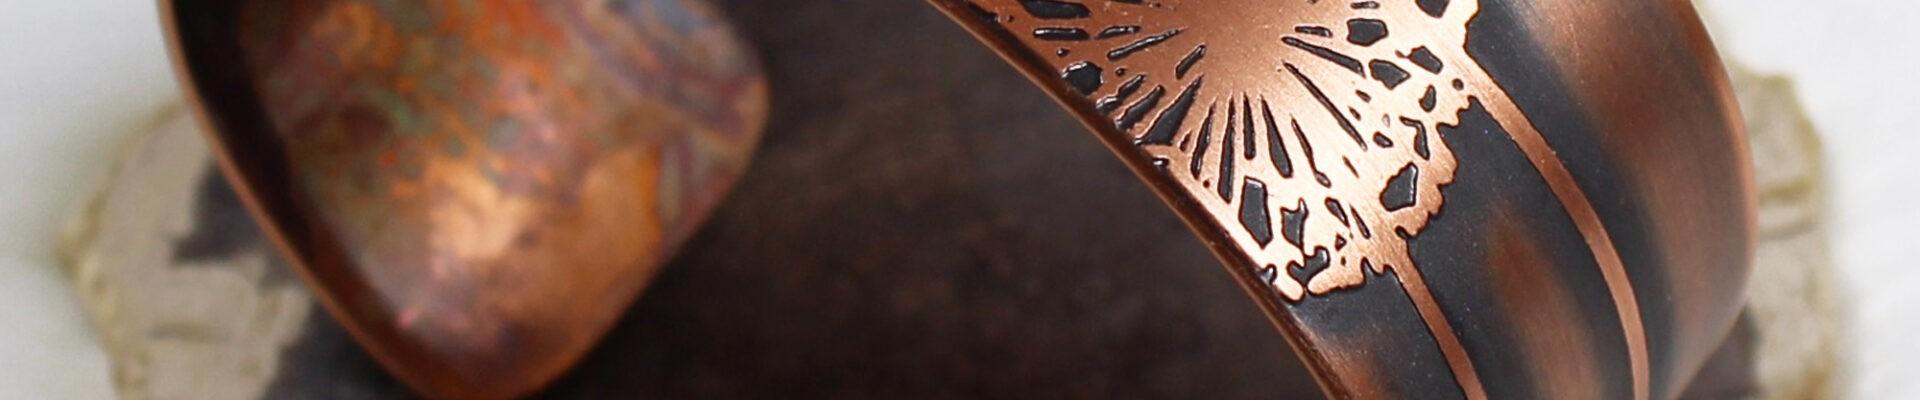 Dandelion, Copper Cuff, Handmade Bracelet